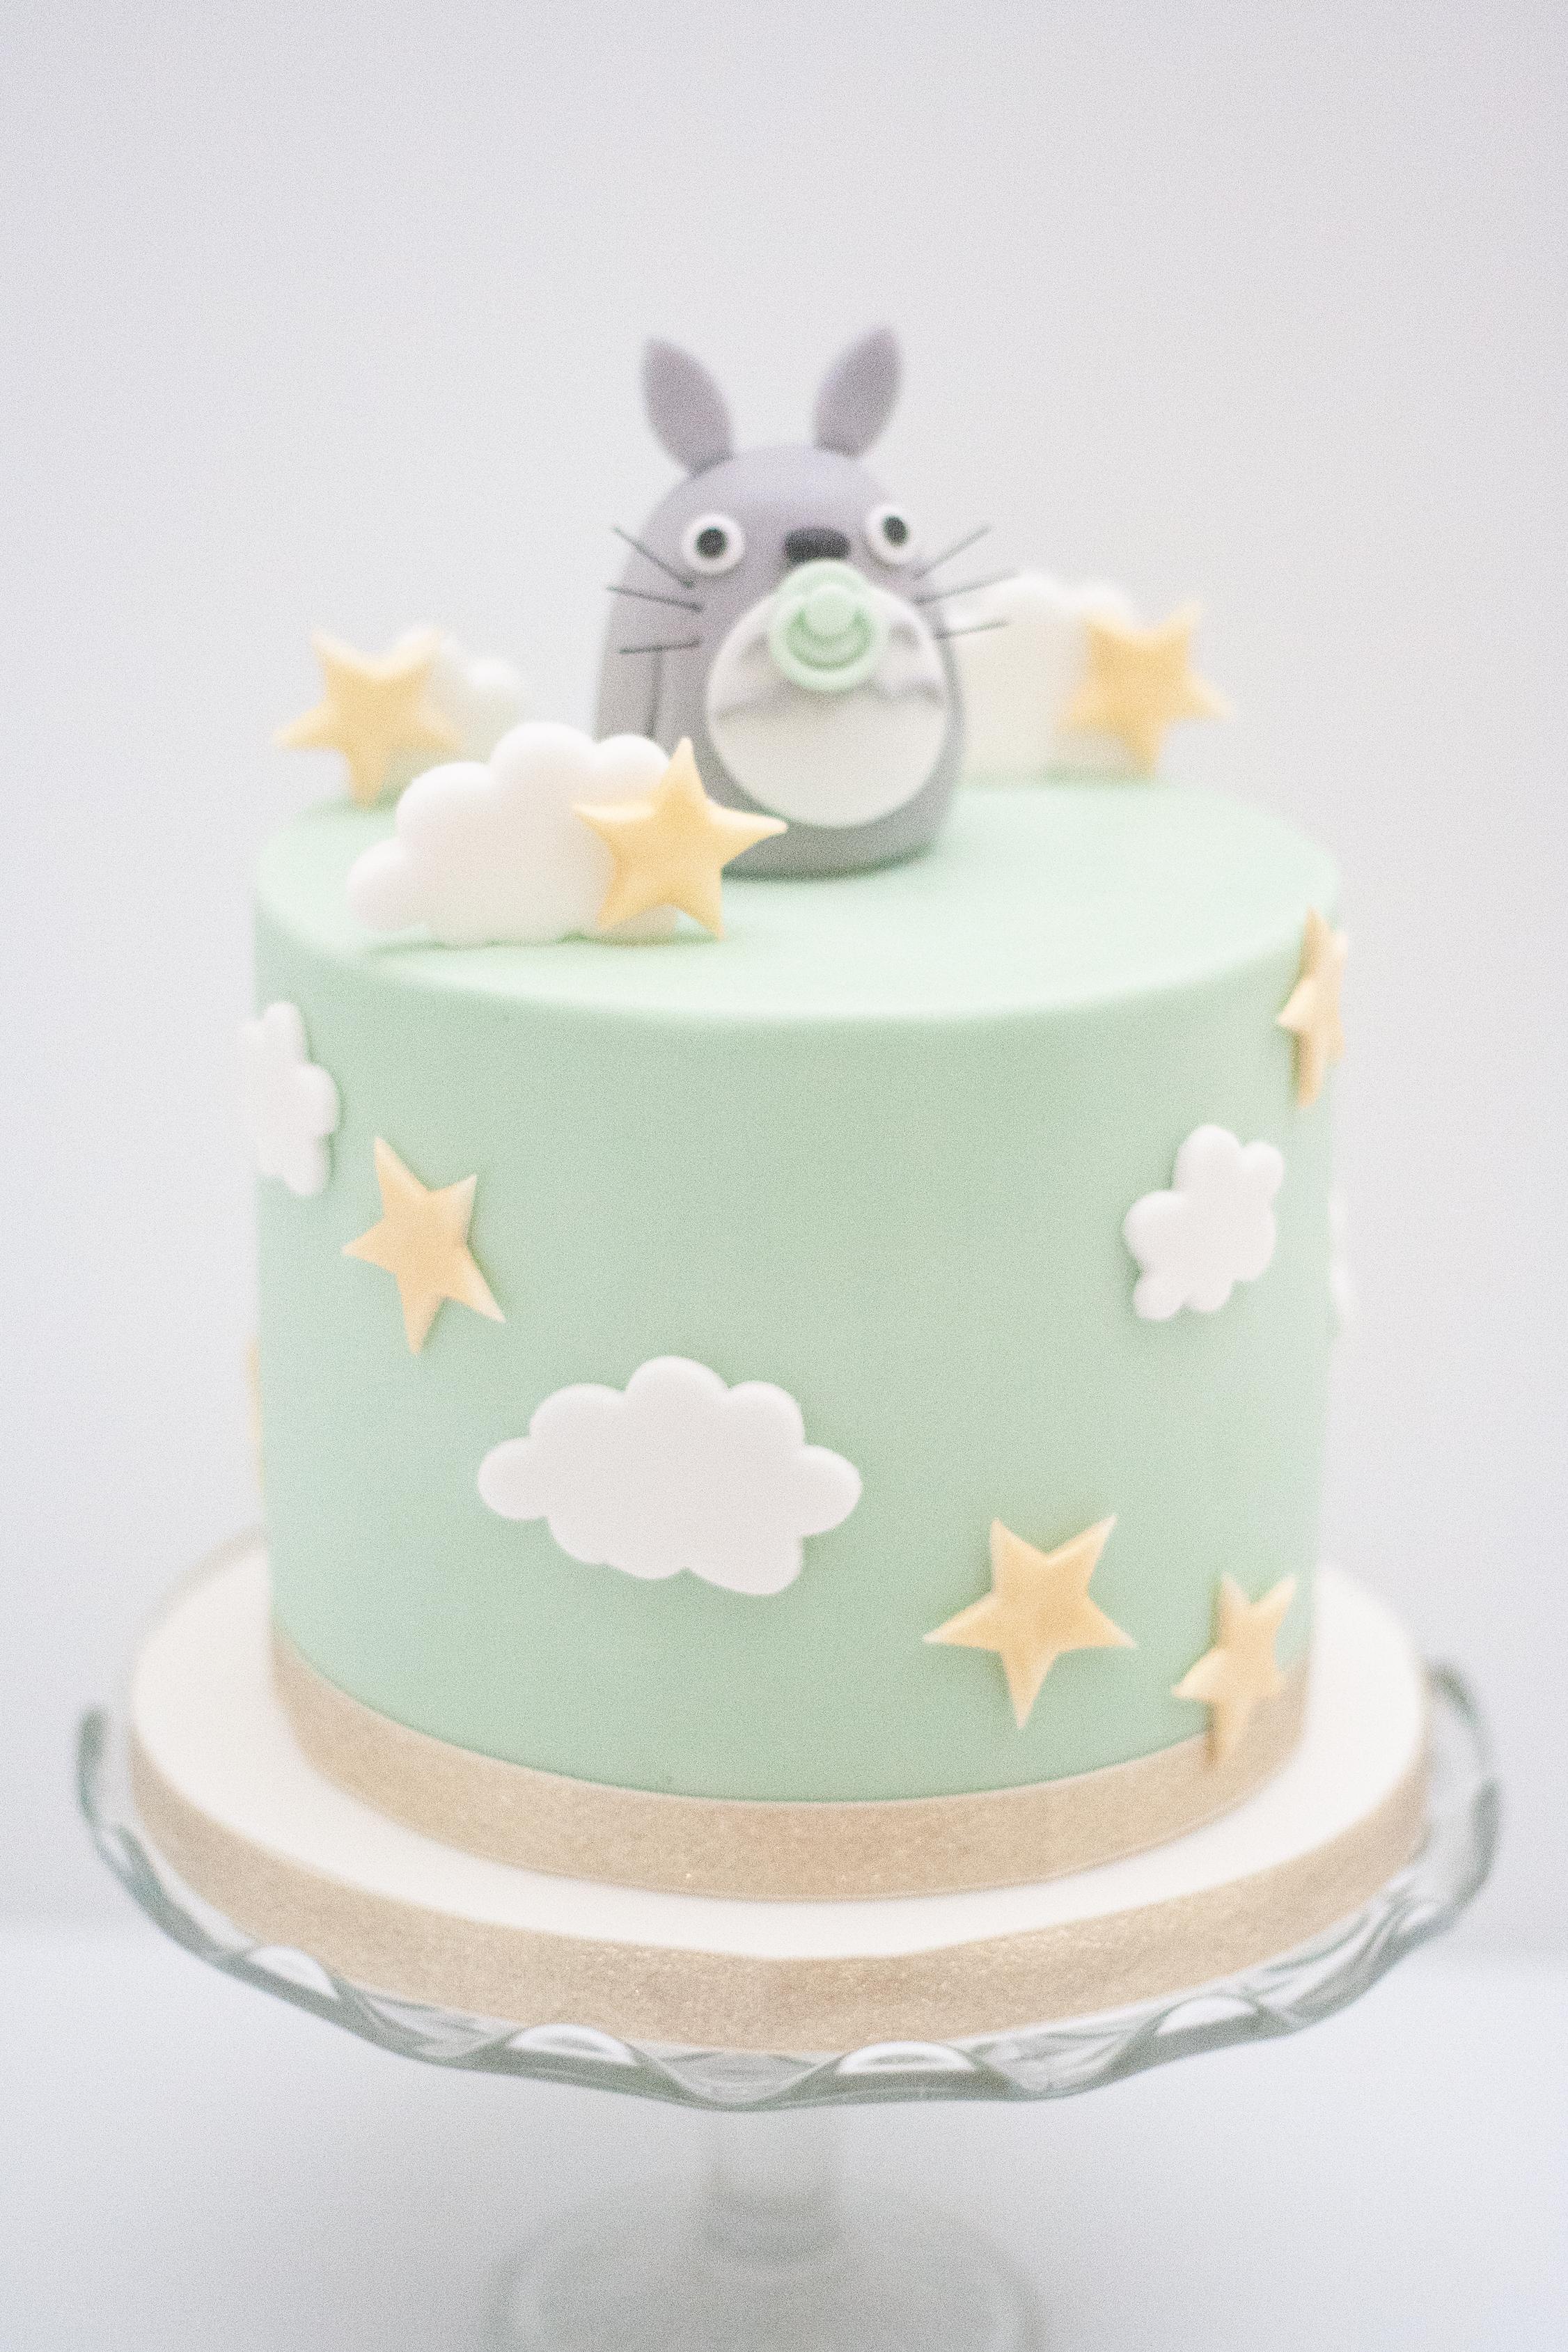 Totoro stars clouds cake